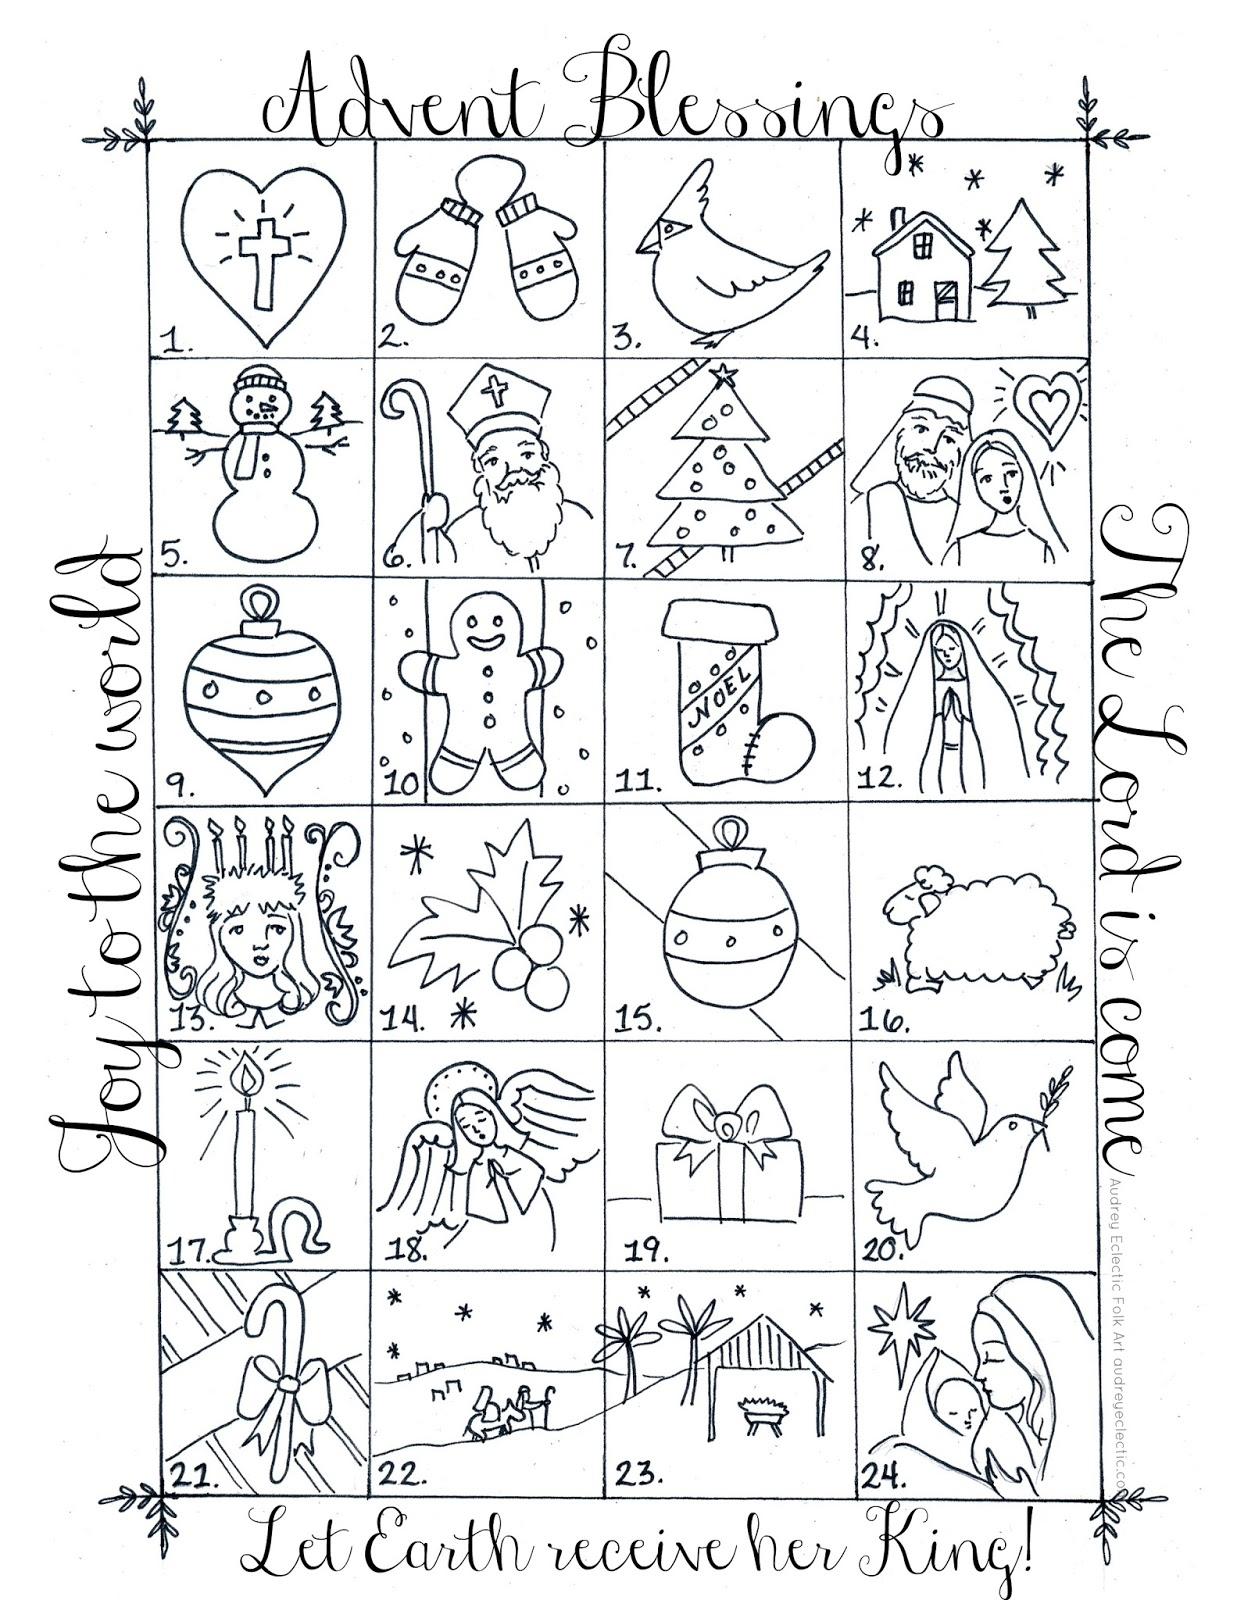 New Printable 24 Day Advent Calendar